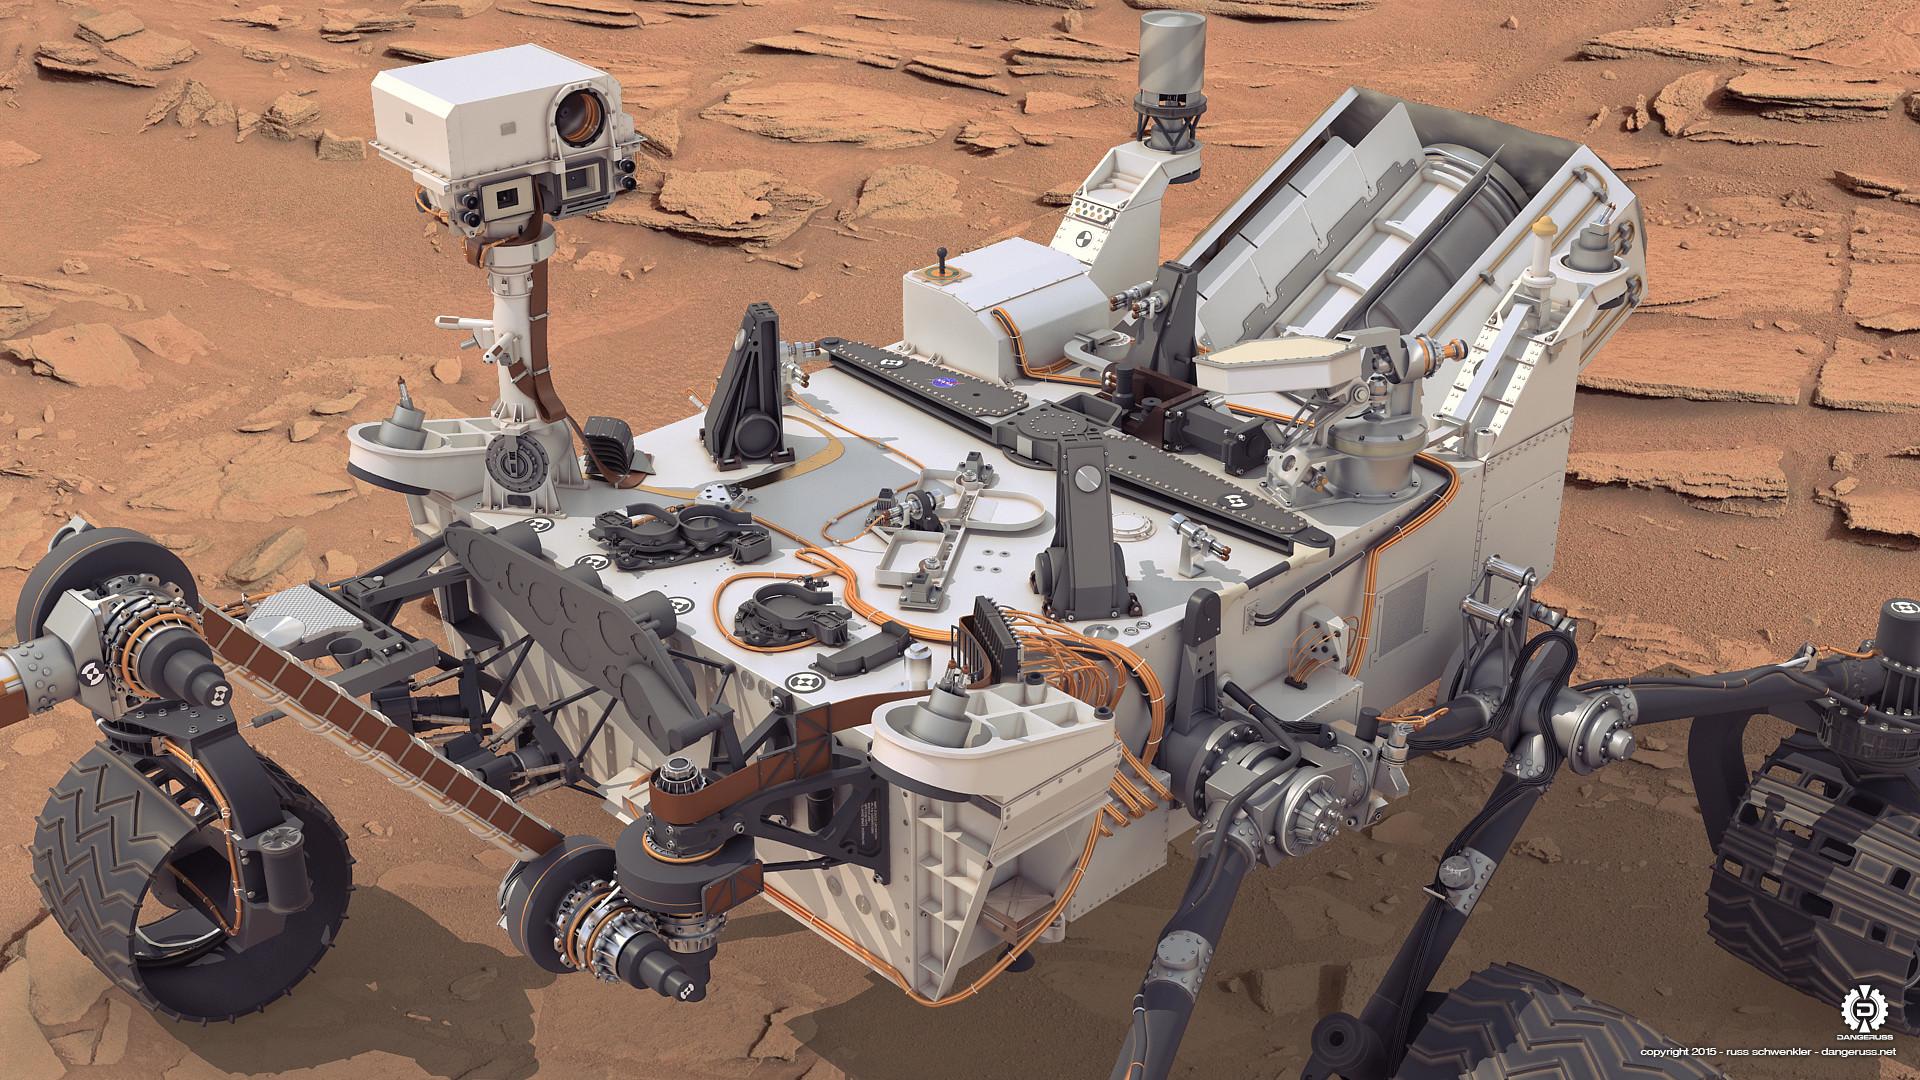 curiosity rover wiki - HD1920×1080